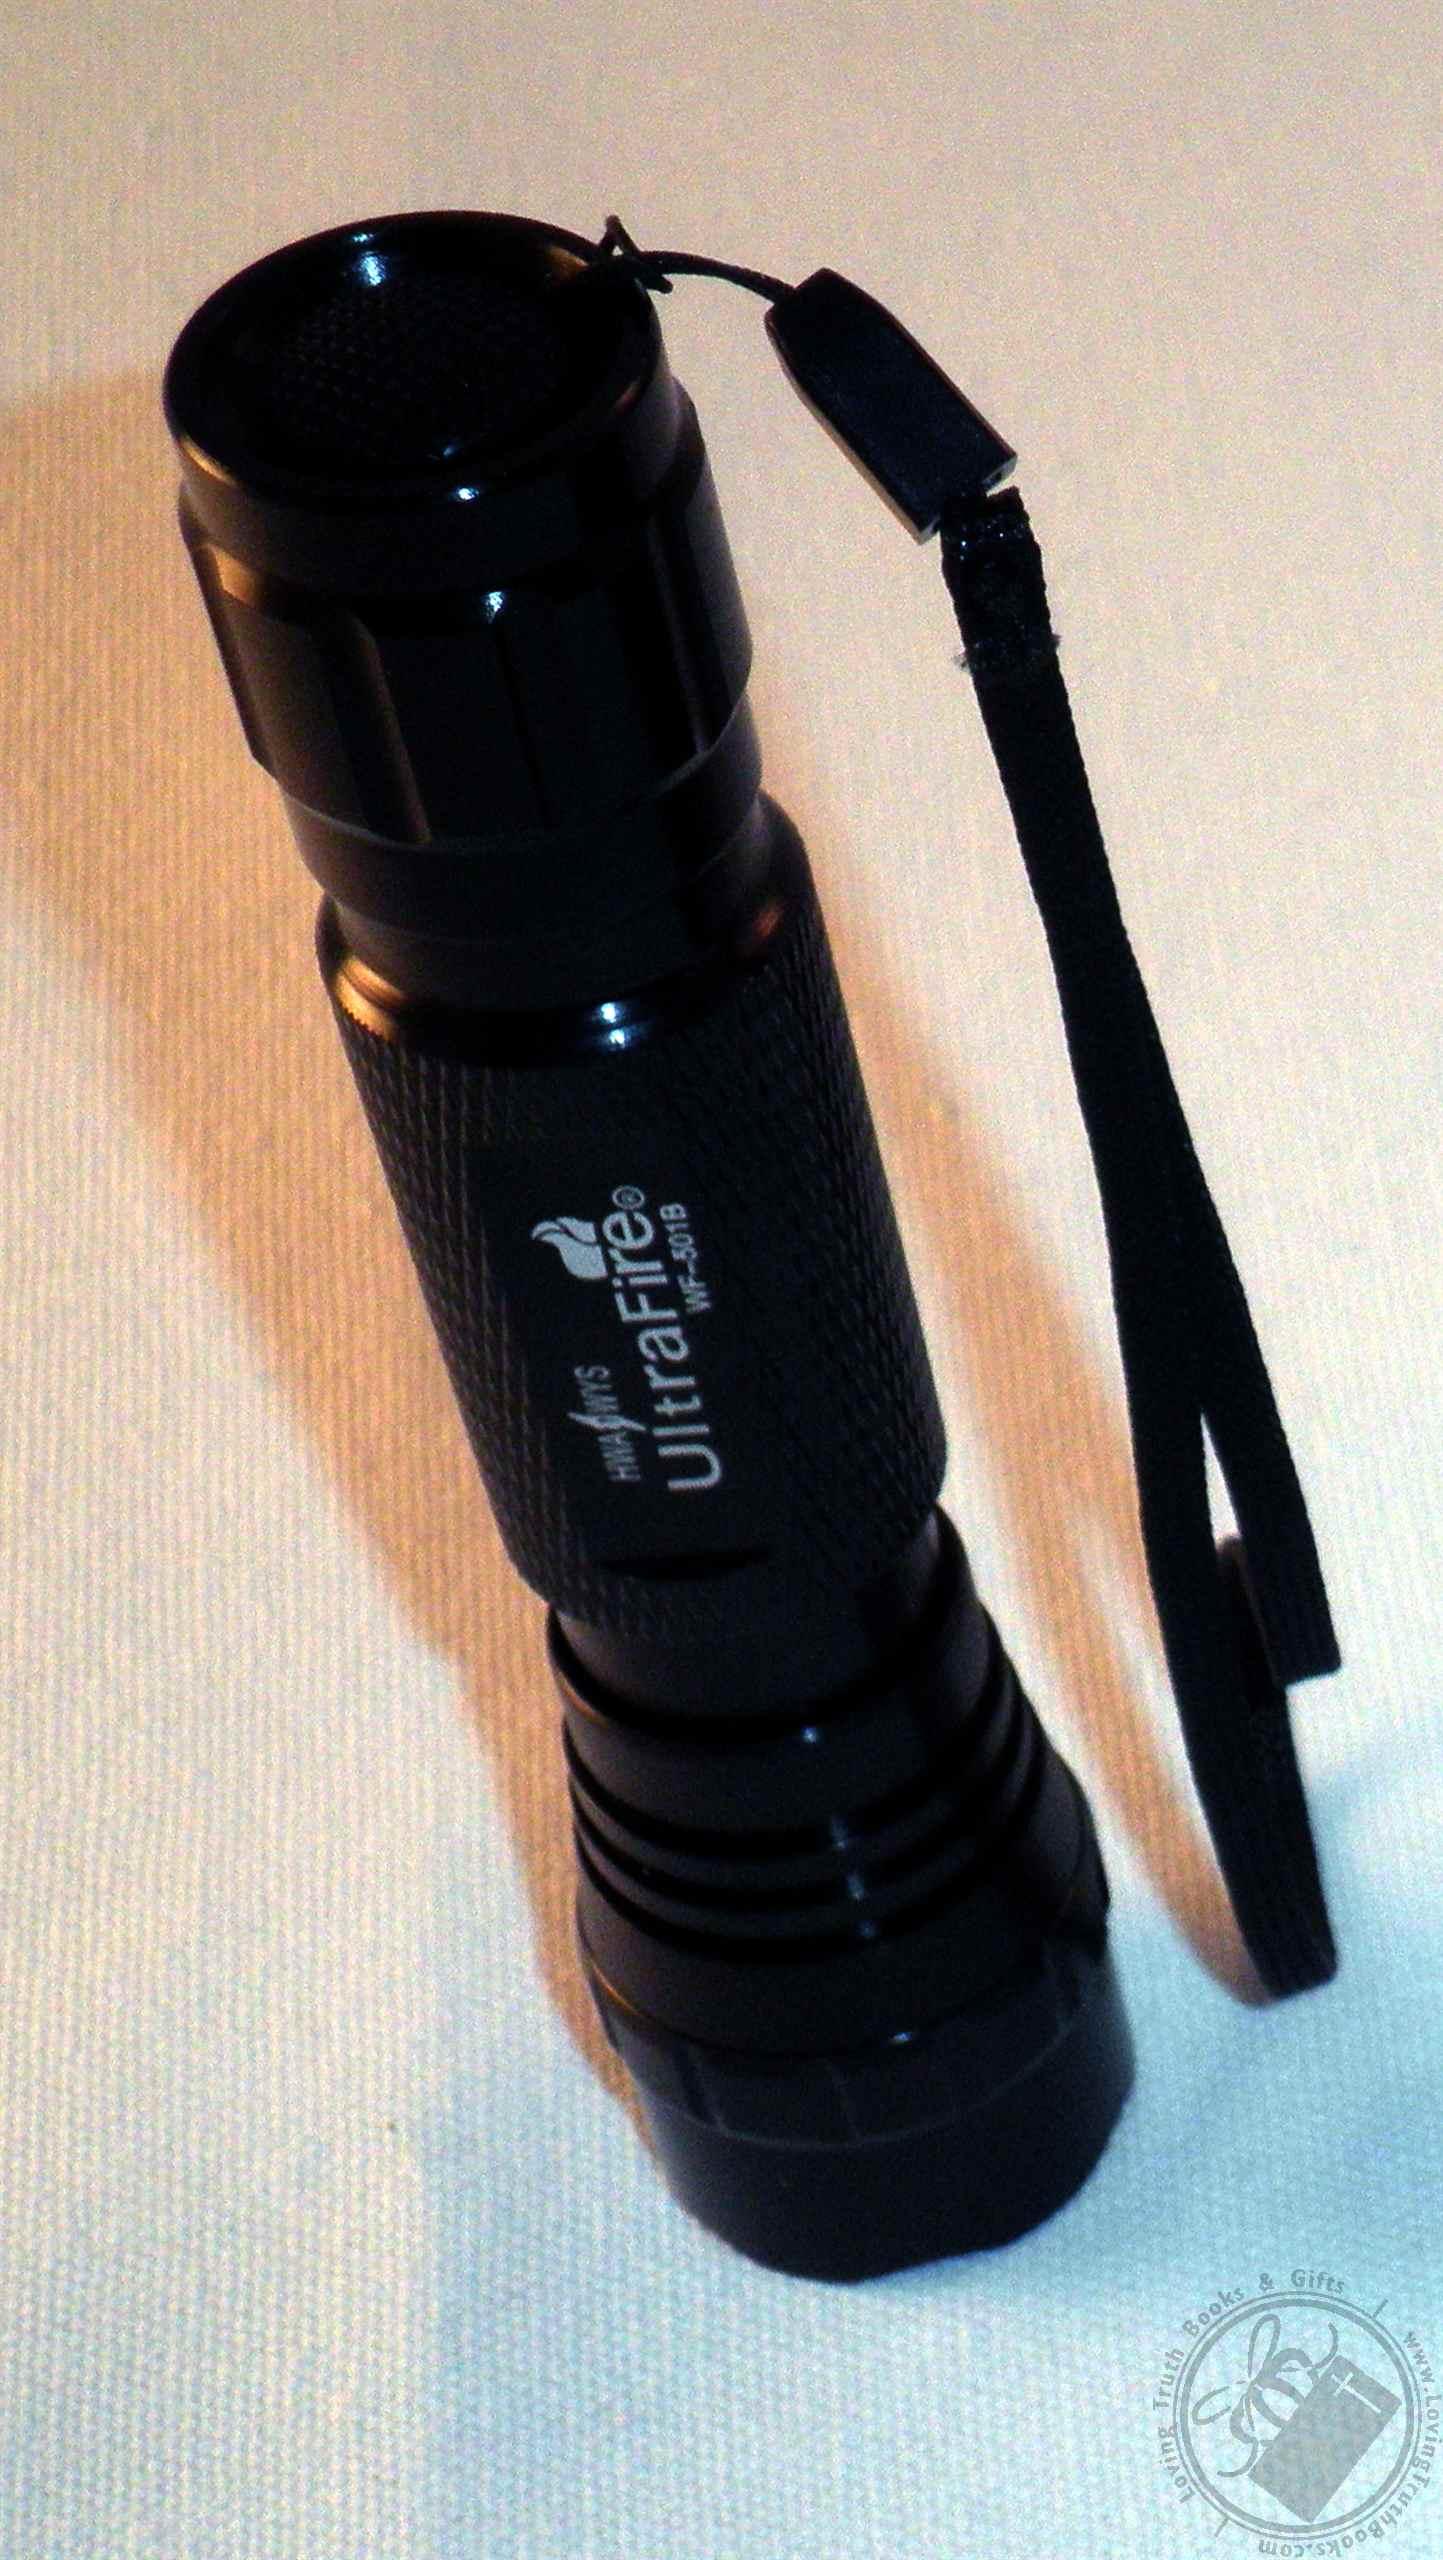 Black Single Mode UltraFire 250 Lumen CREE White LED